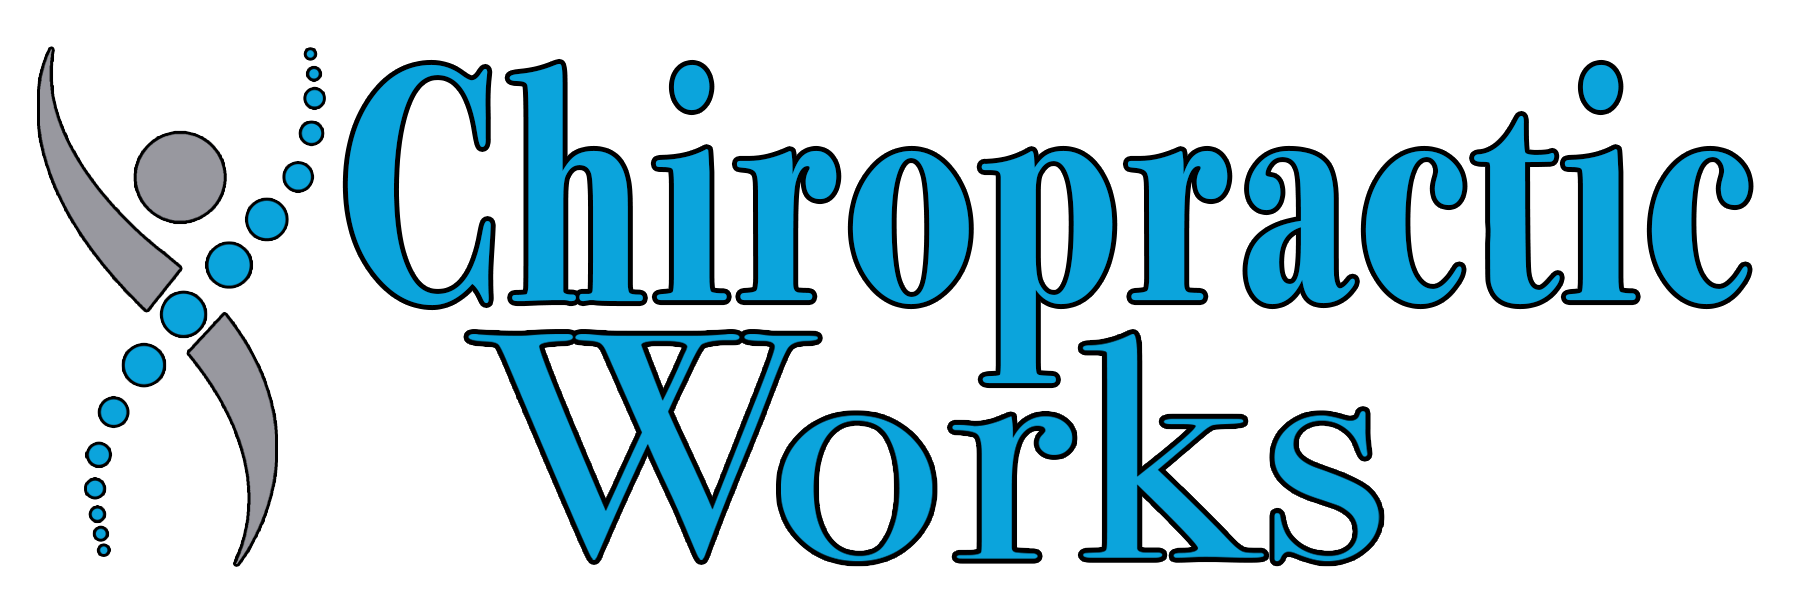 Chiropractic Works - Atlanta, GA Premier Chiropractic Care